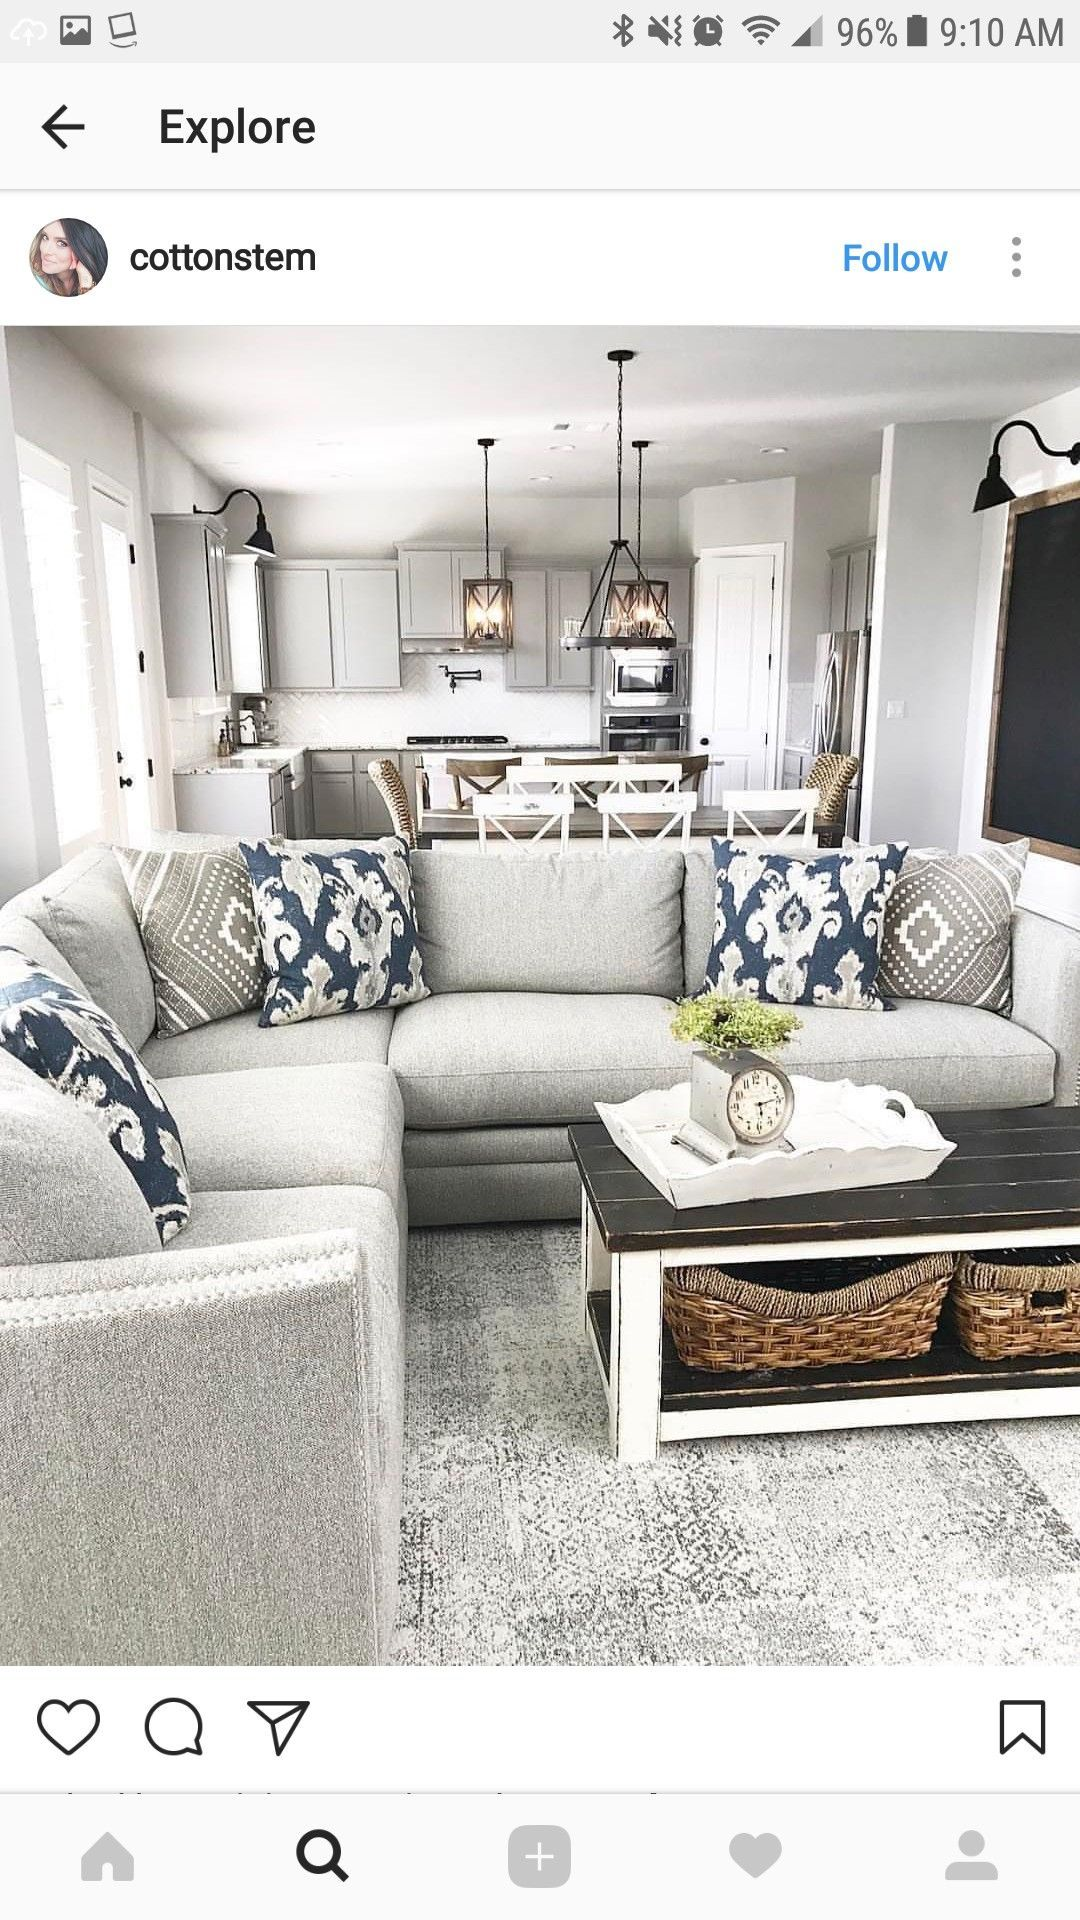 Modern farmhouse living room kitchen decor Great light fixtures